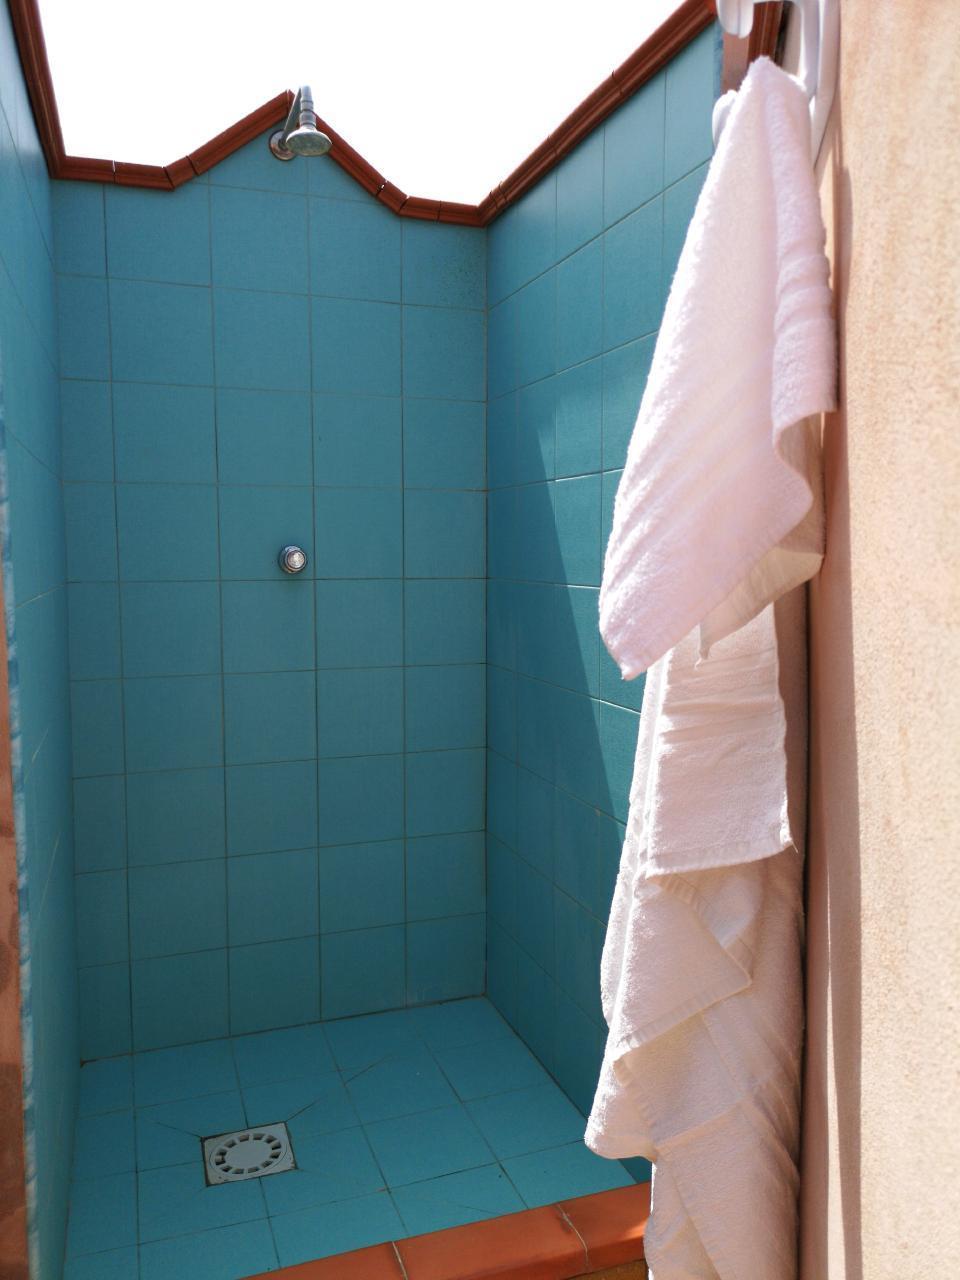 Maison de vacances Costa Mediterranea Ferienhaus (2129632), Cefalù, Palermo, Sicile, Italie, image 25